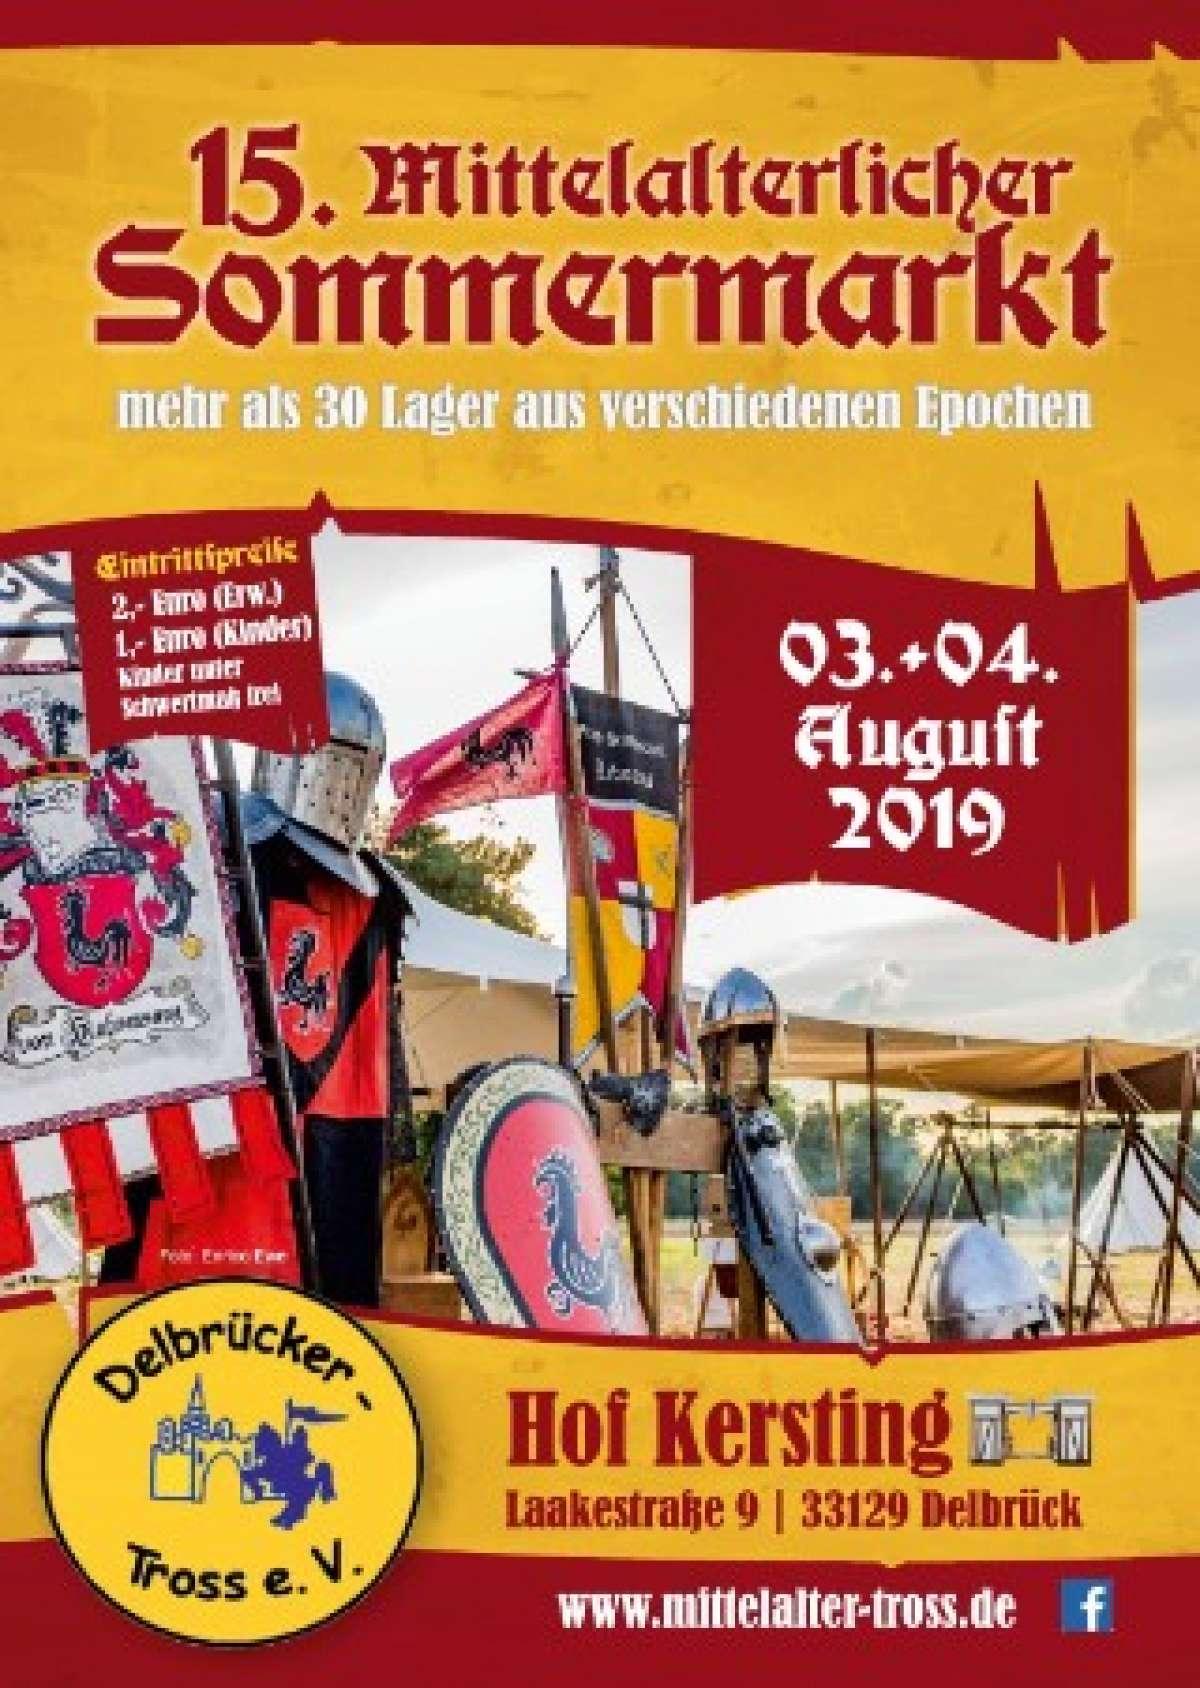 15. Mittelalterlicher  Sommermarkt - Hof Kersting - Delbrück